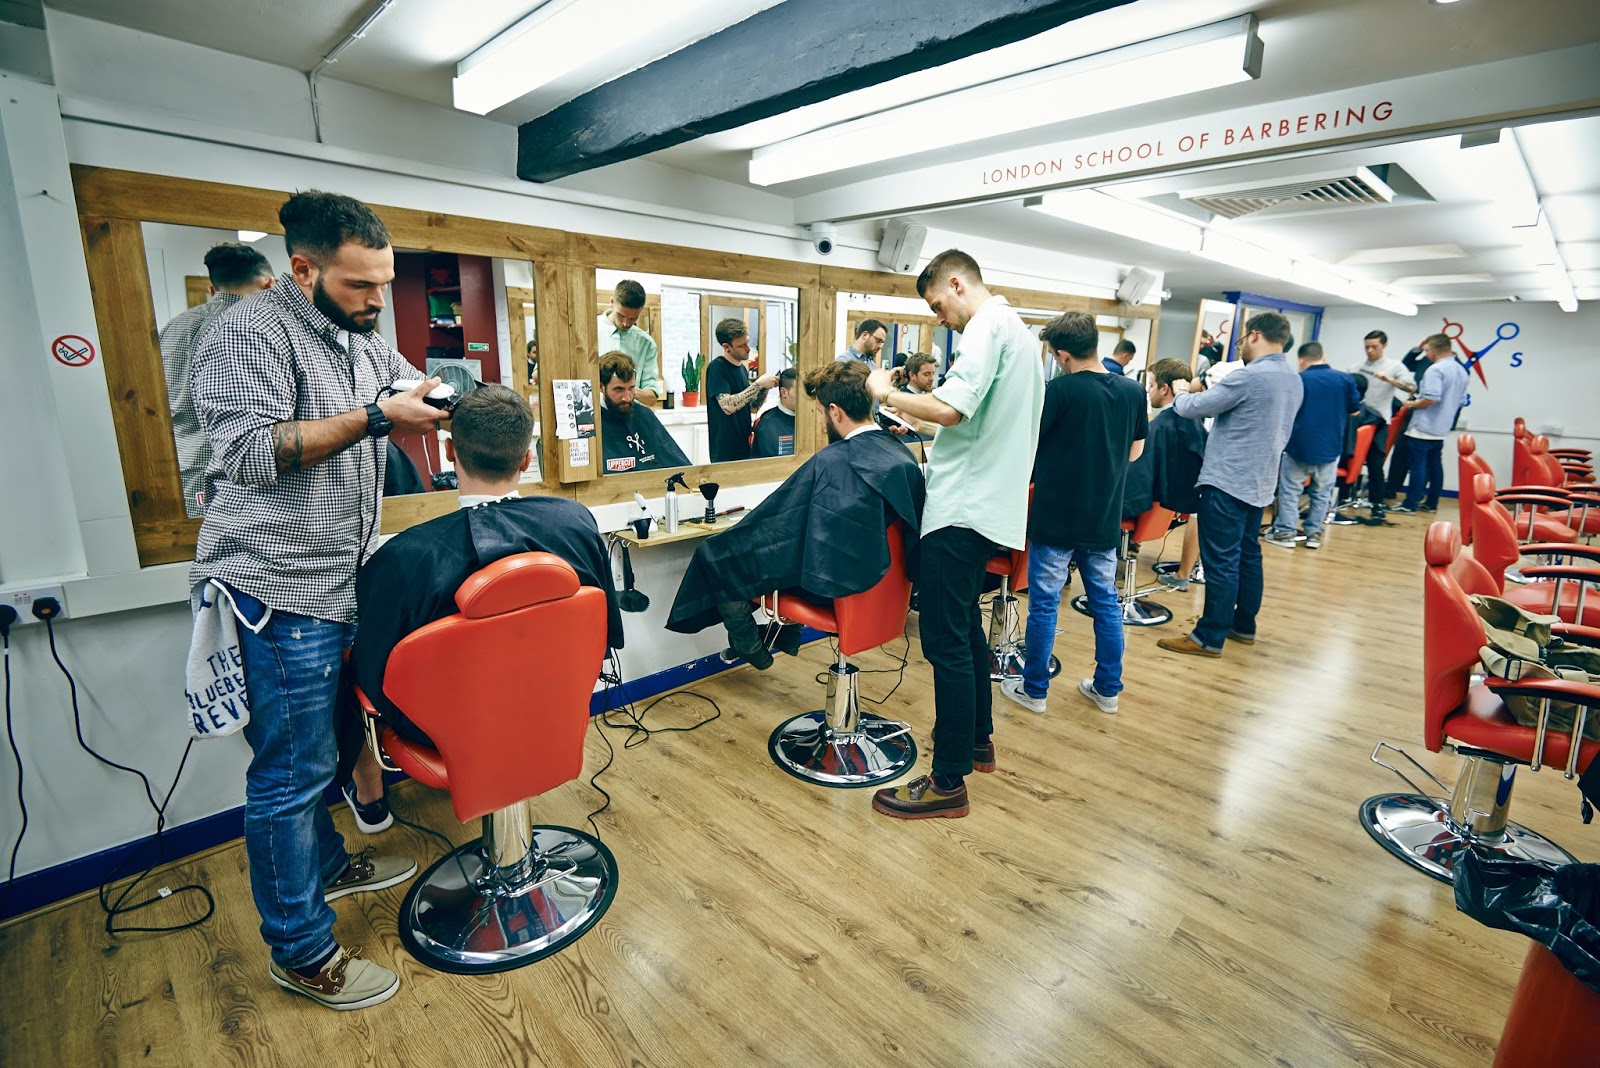 Barber School : THE LONDON SCHOOL OF BARBERING: UKS LEADER IN BARBERING COURSES ~ THE ...